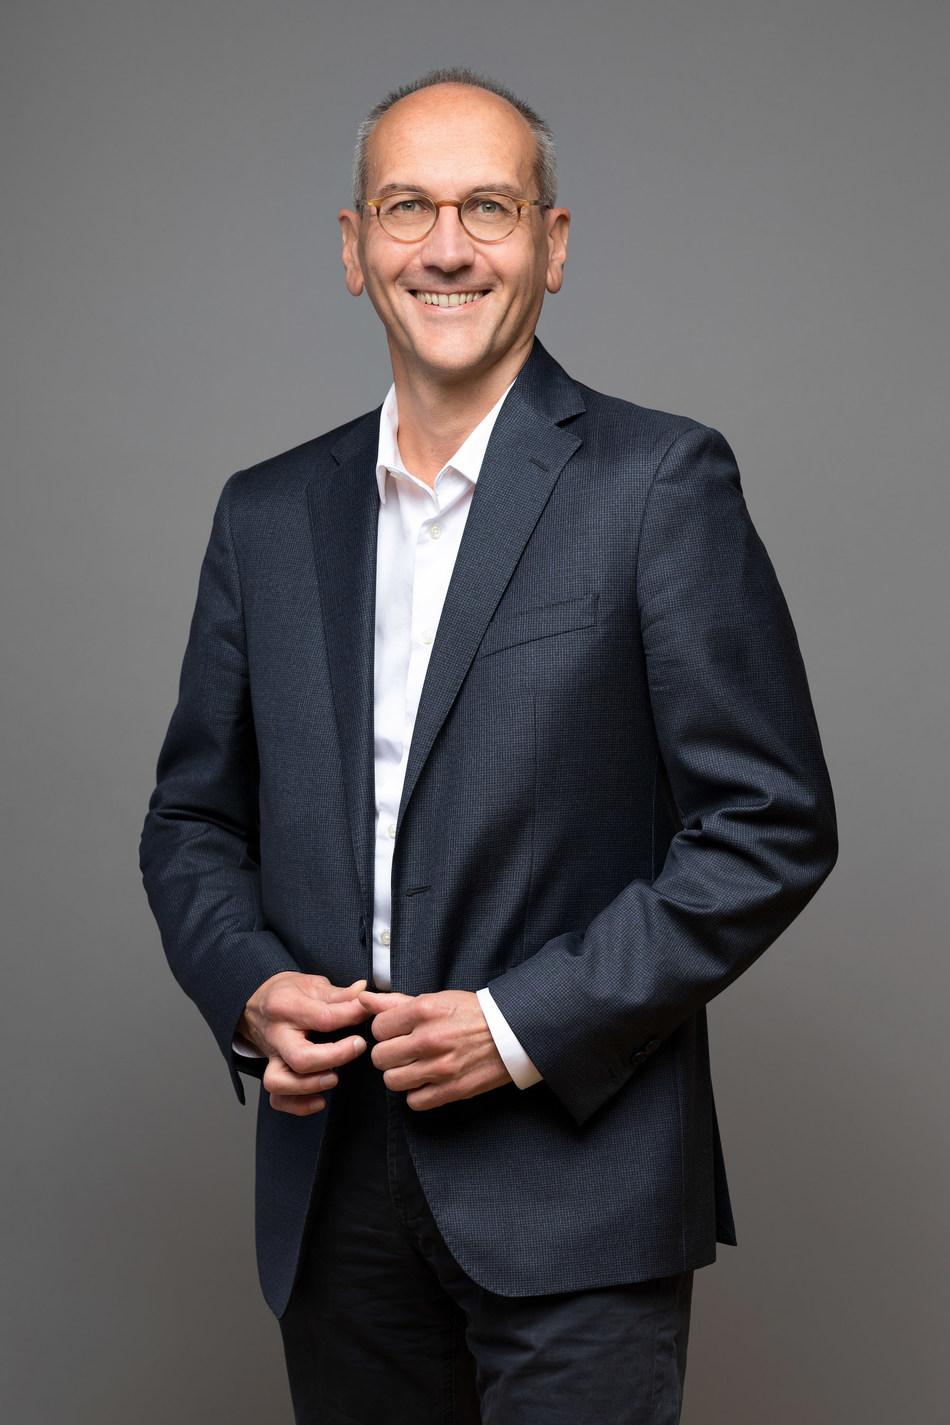 Emmanuel SCHMIDT Directeur Financier (CFO) du Groupe Ethypharm. (PRNewsfoto/Ethypharm)